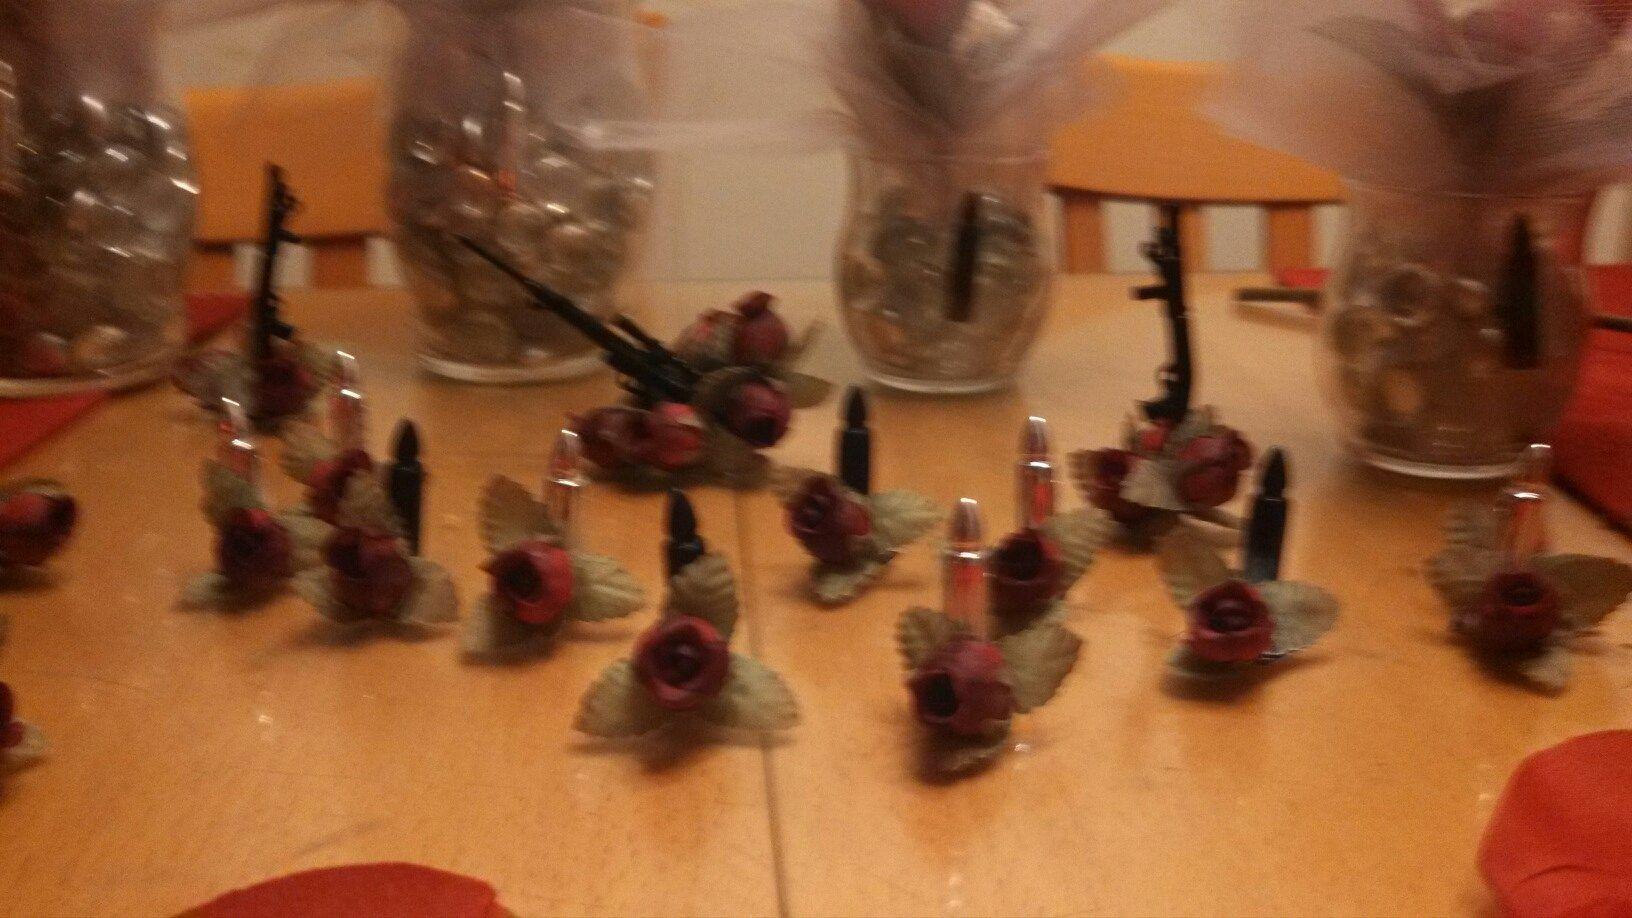 39 N Holding guns n roses decorations Guns n roses